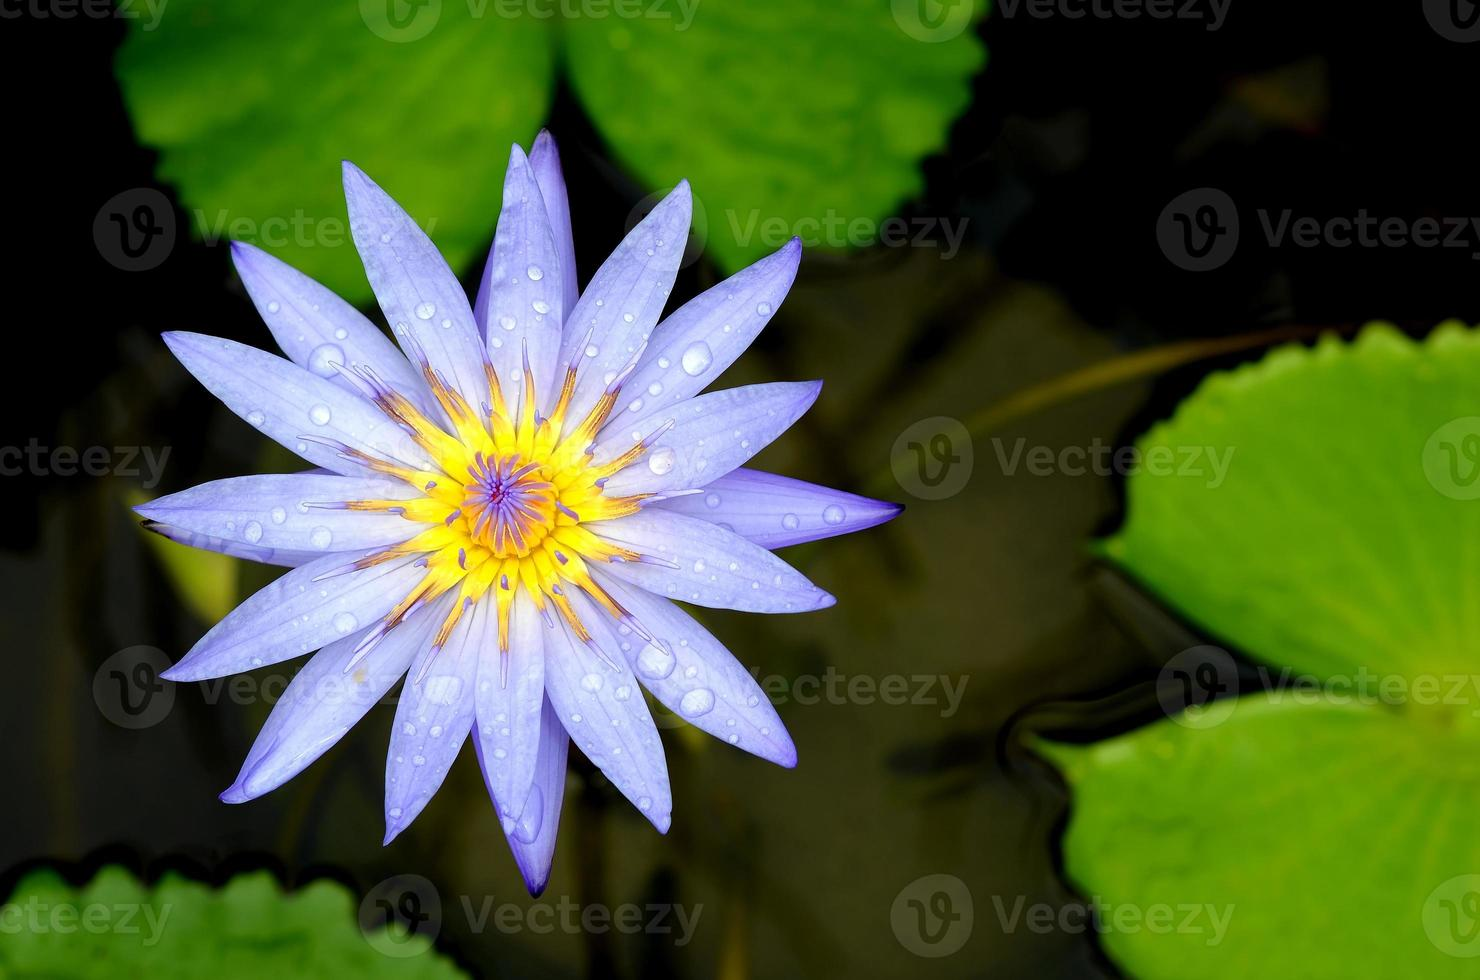 blauwe lotusbloem op de vijver foto